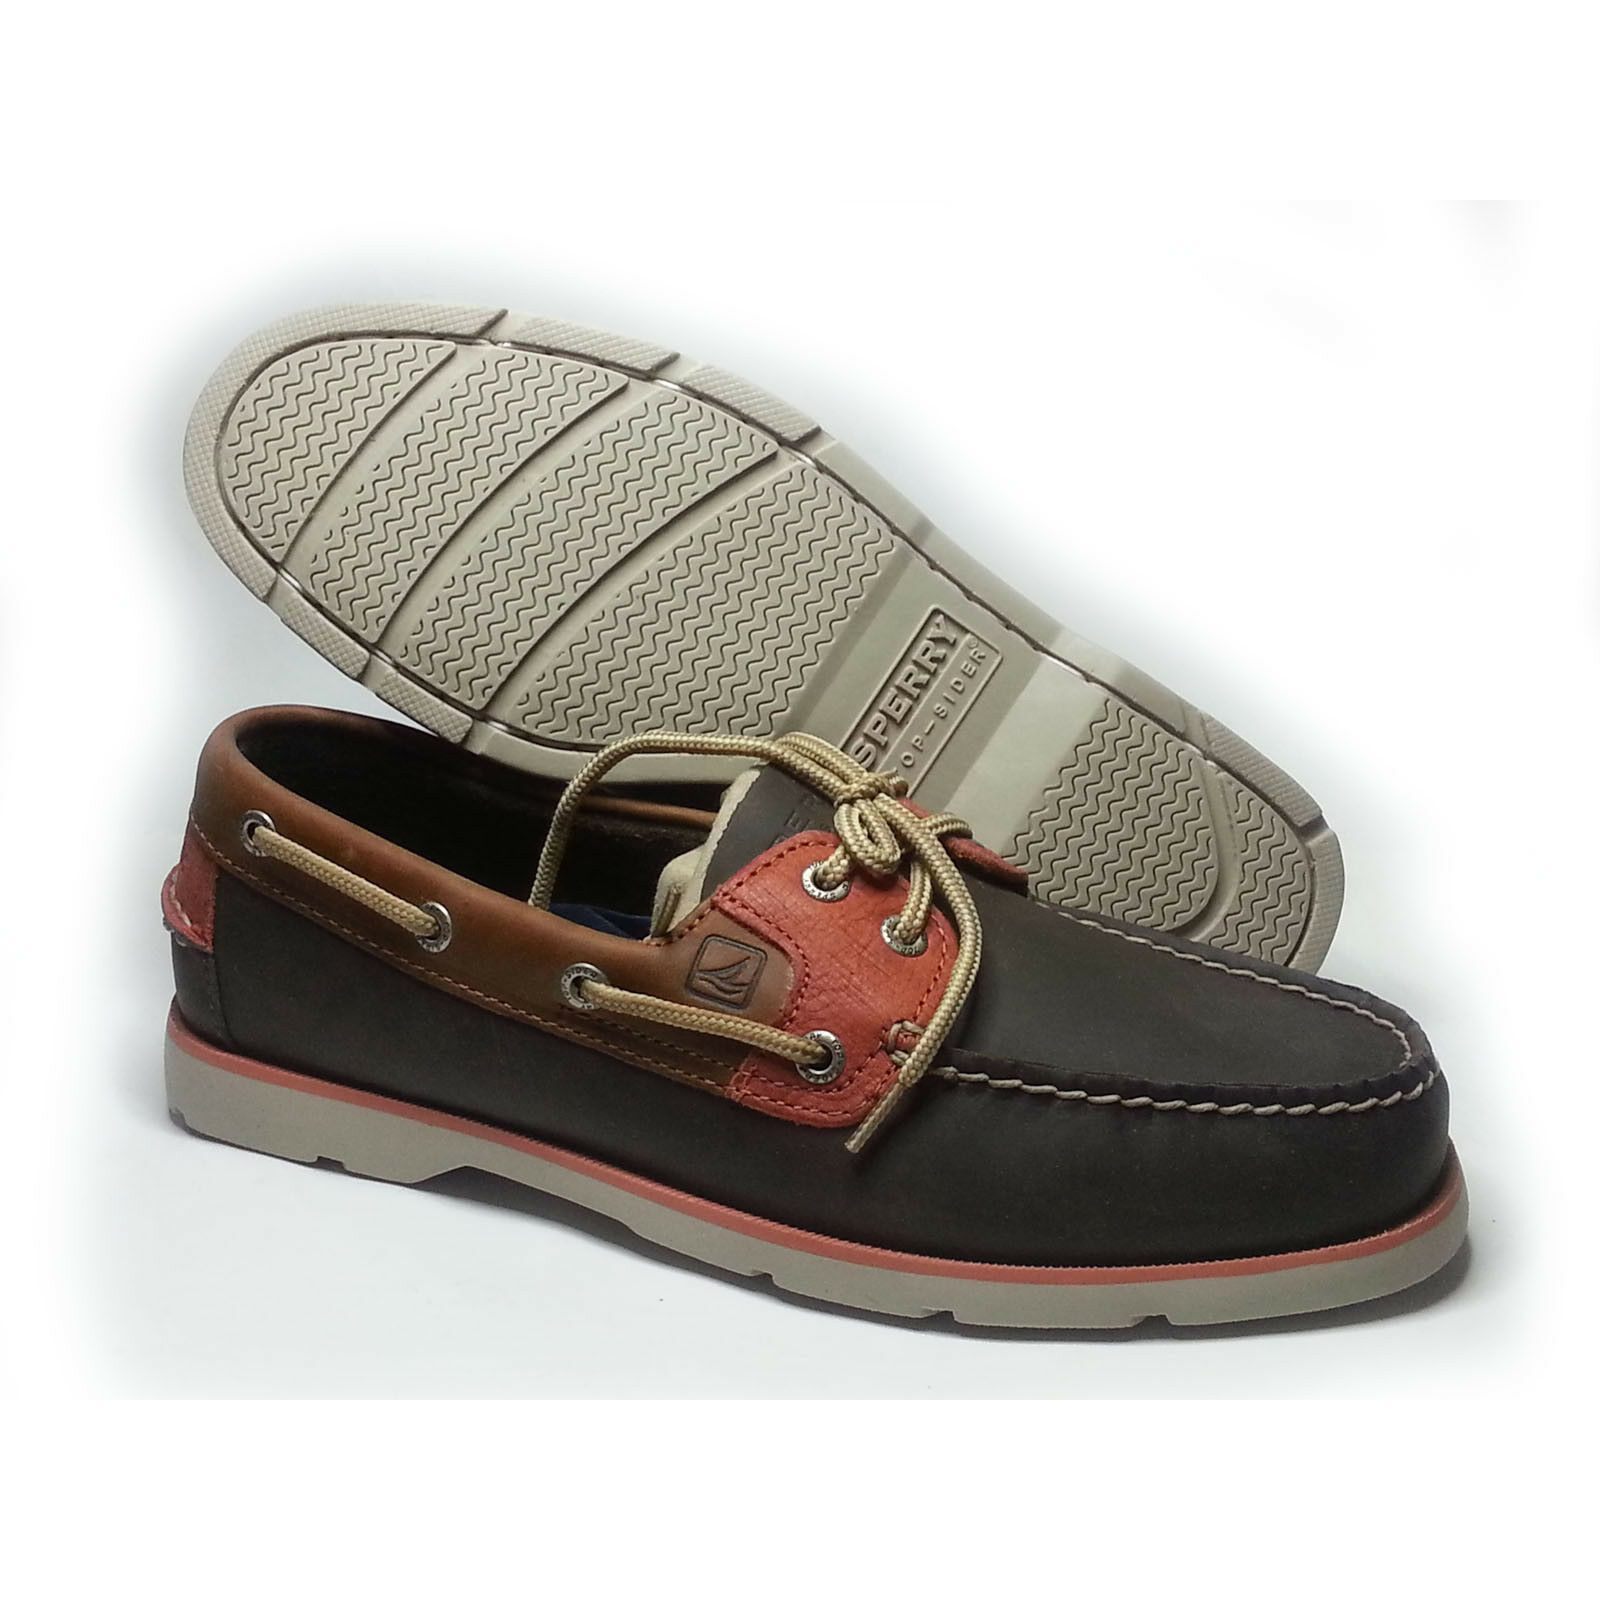 Sperry Top-Sider Men Size 8.5 Boat shoes LEEWARD DK Brown Tan orange NIB